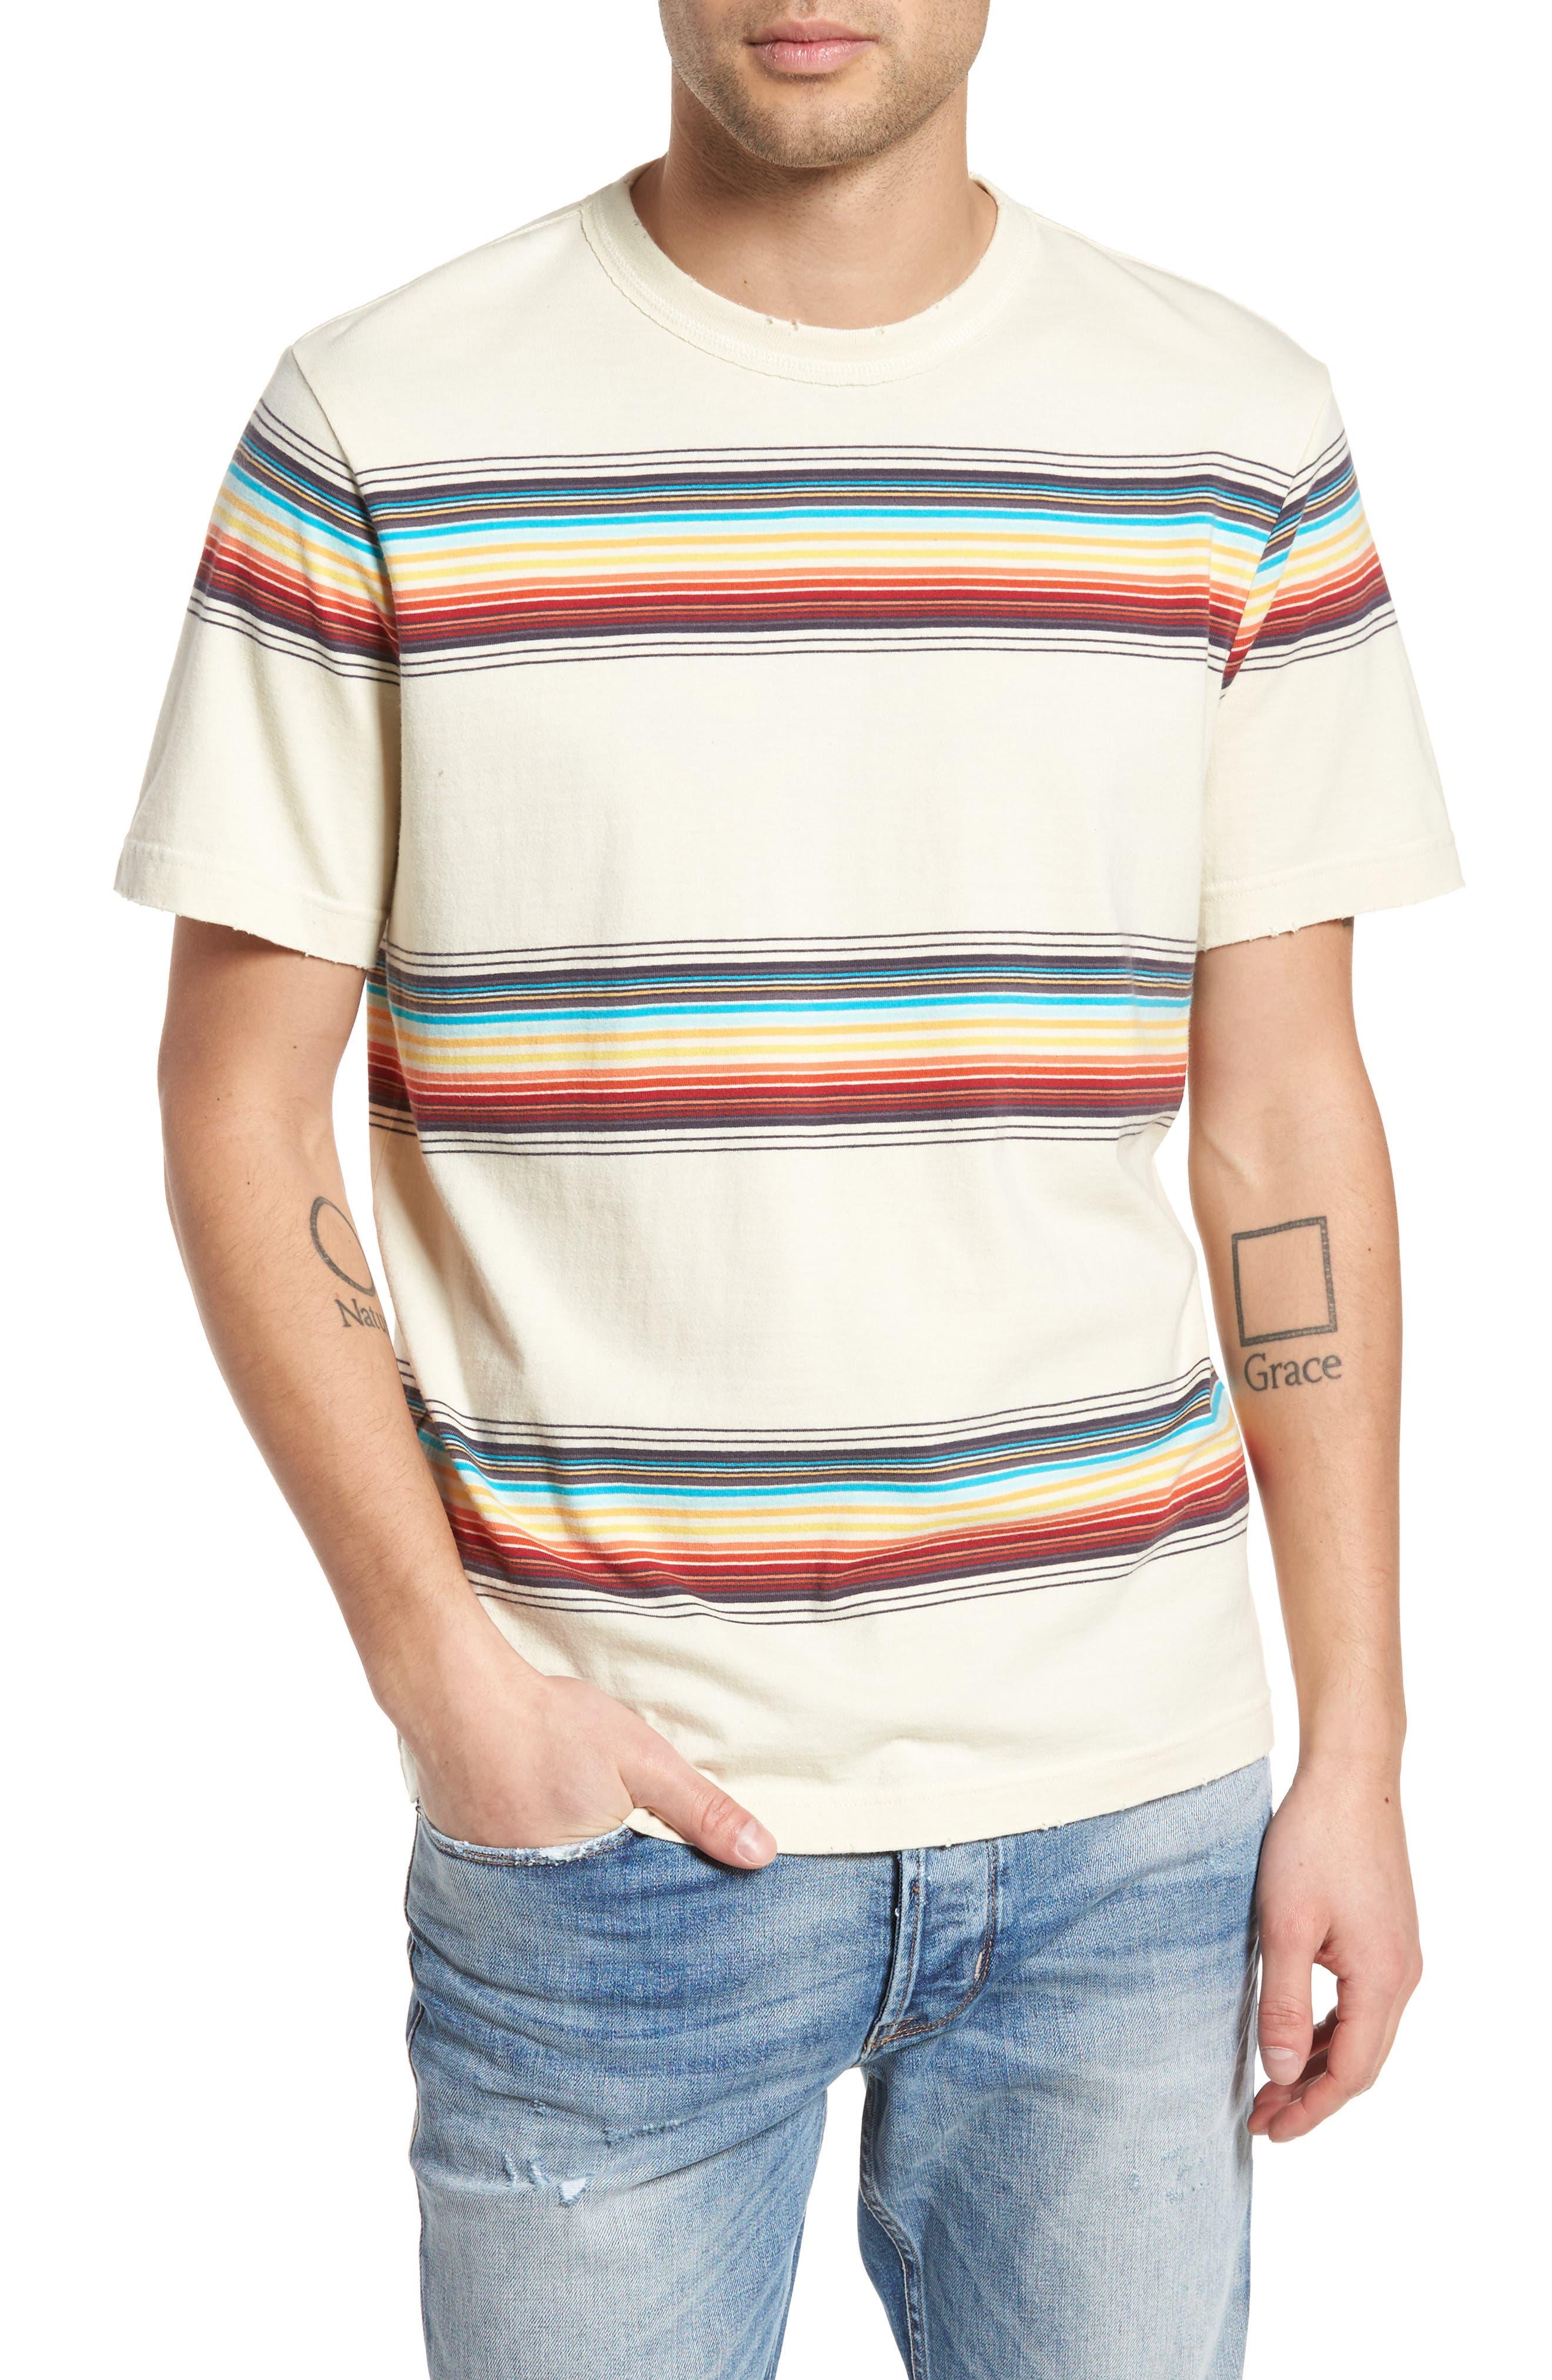 The Rail Vintage Stripe T-Shirt